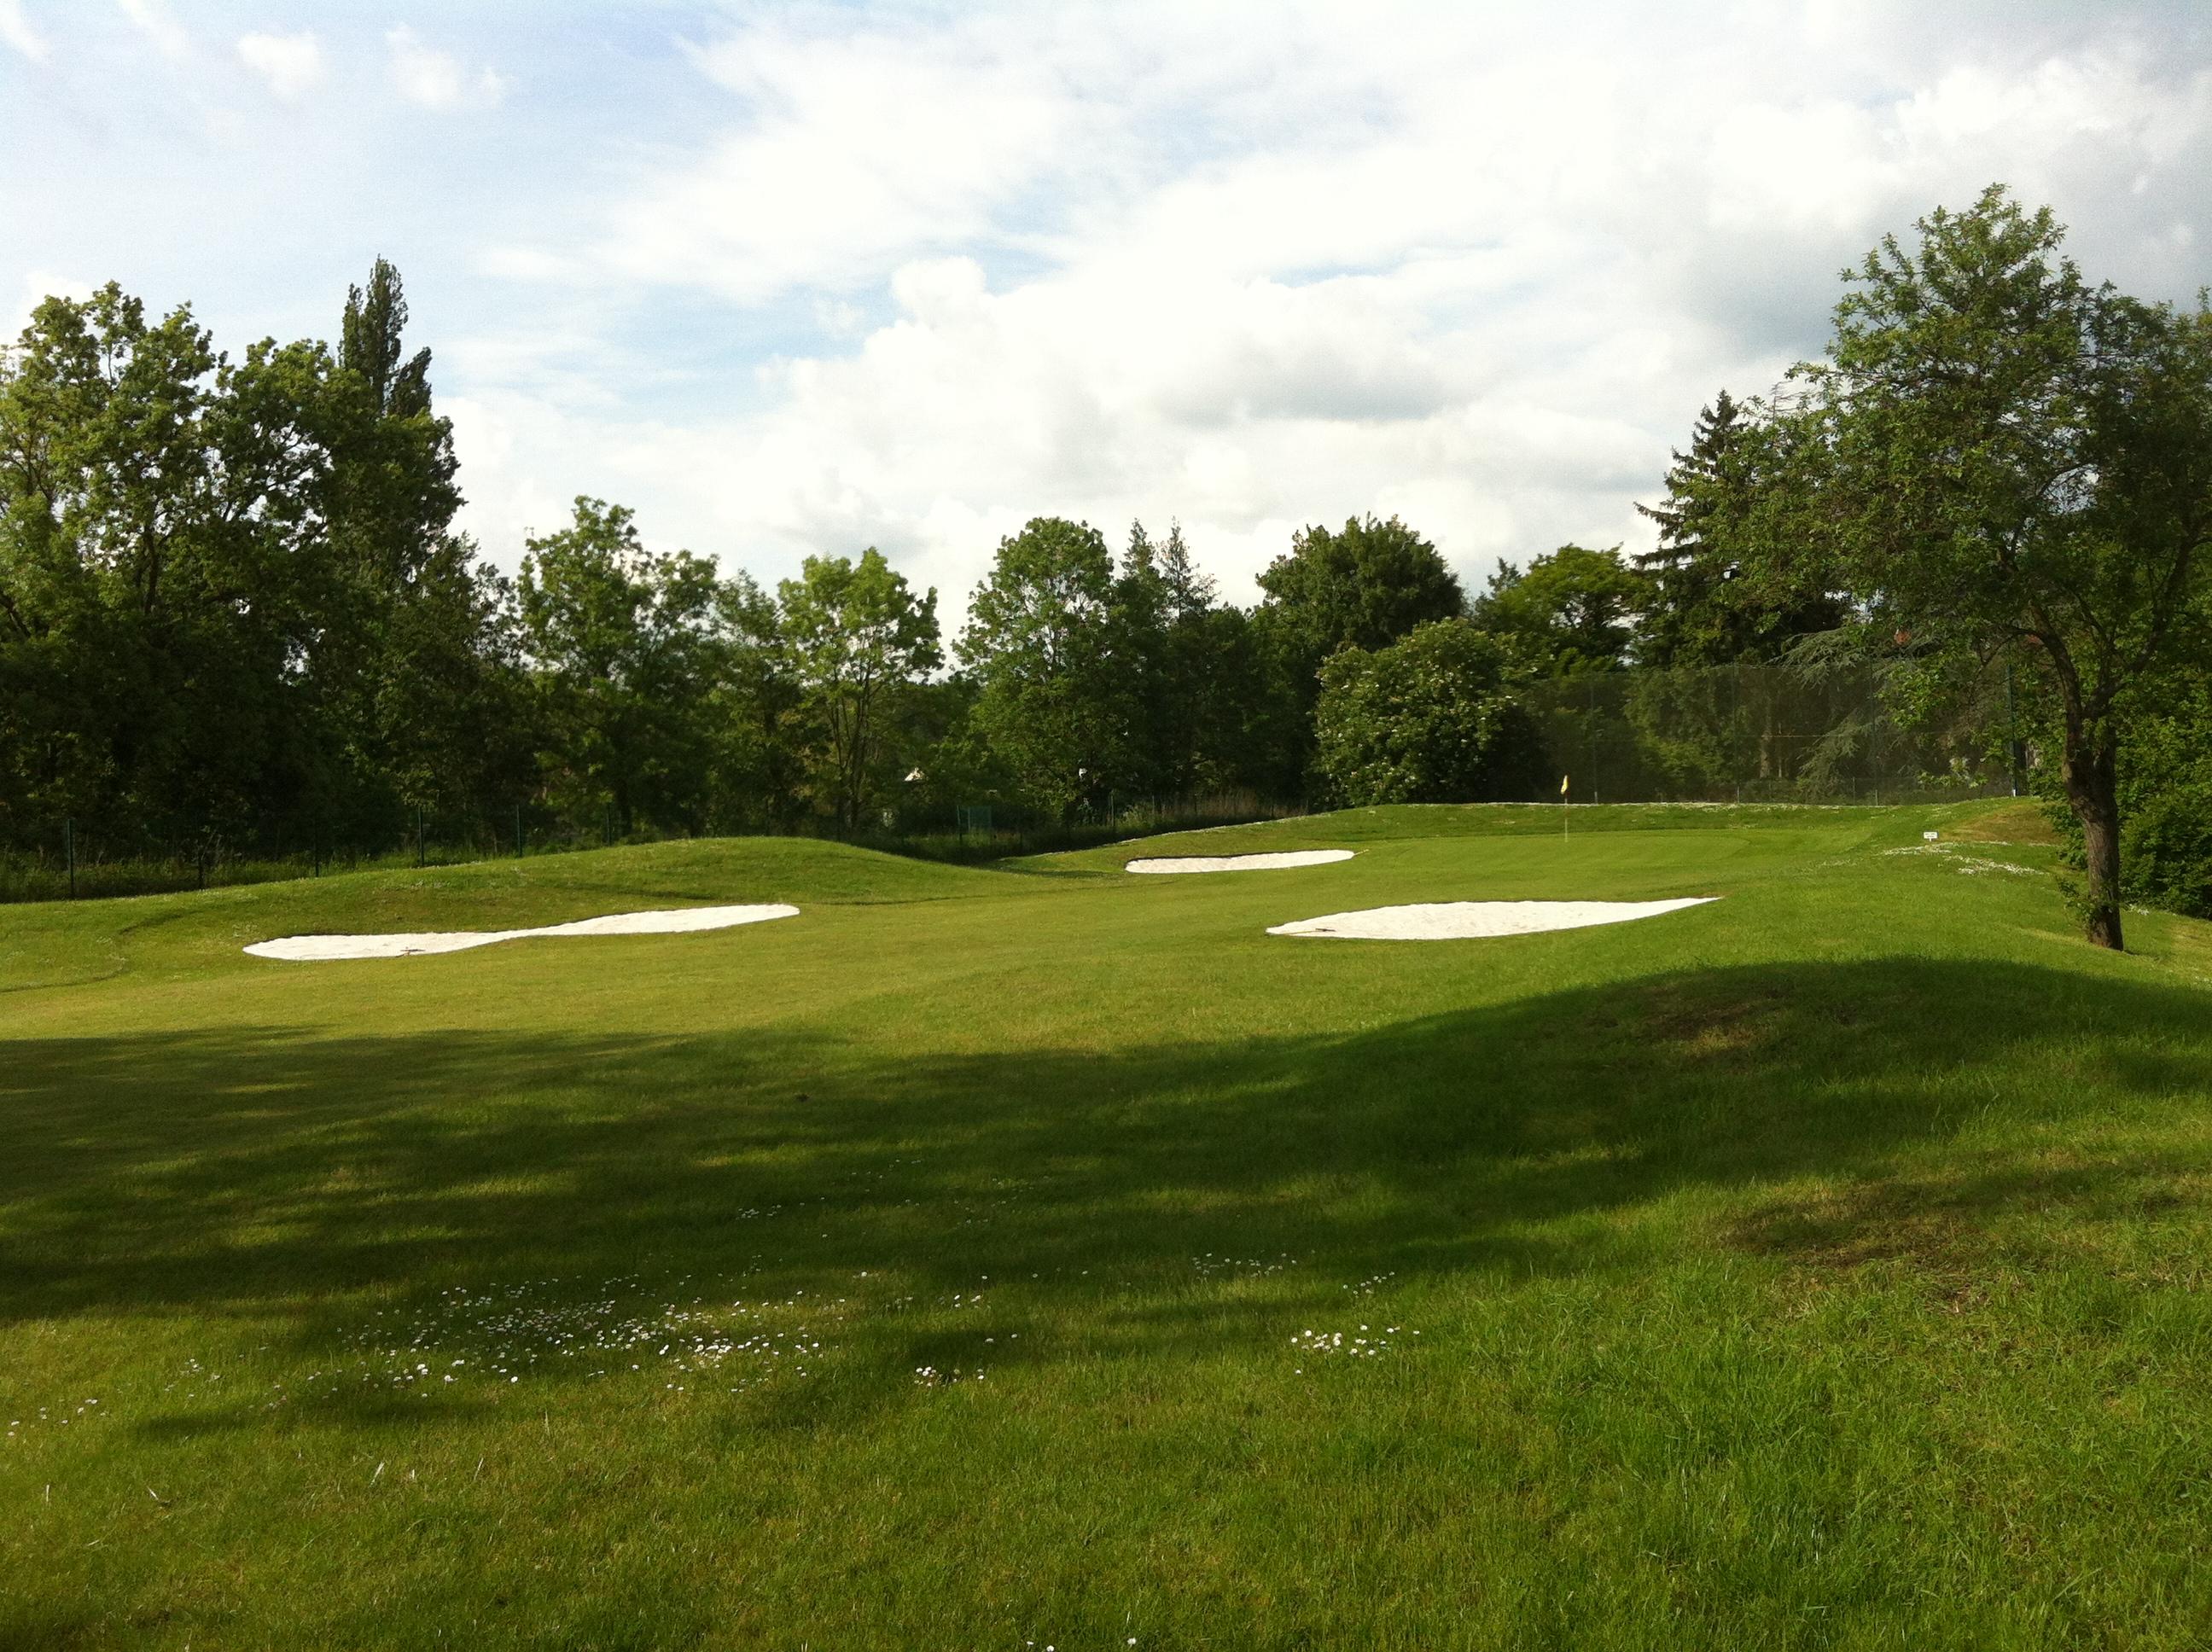 Overview of golf course named Saint Ouen L'Aumone Golf Club